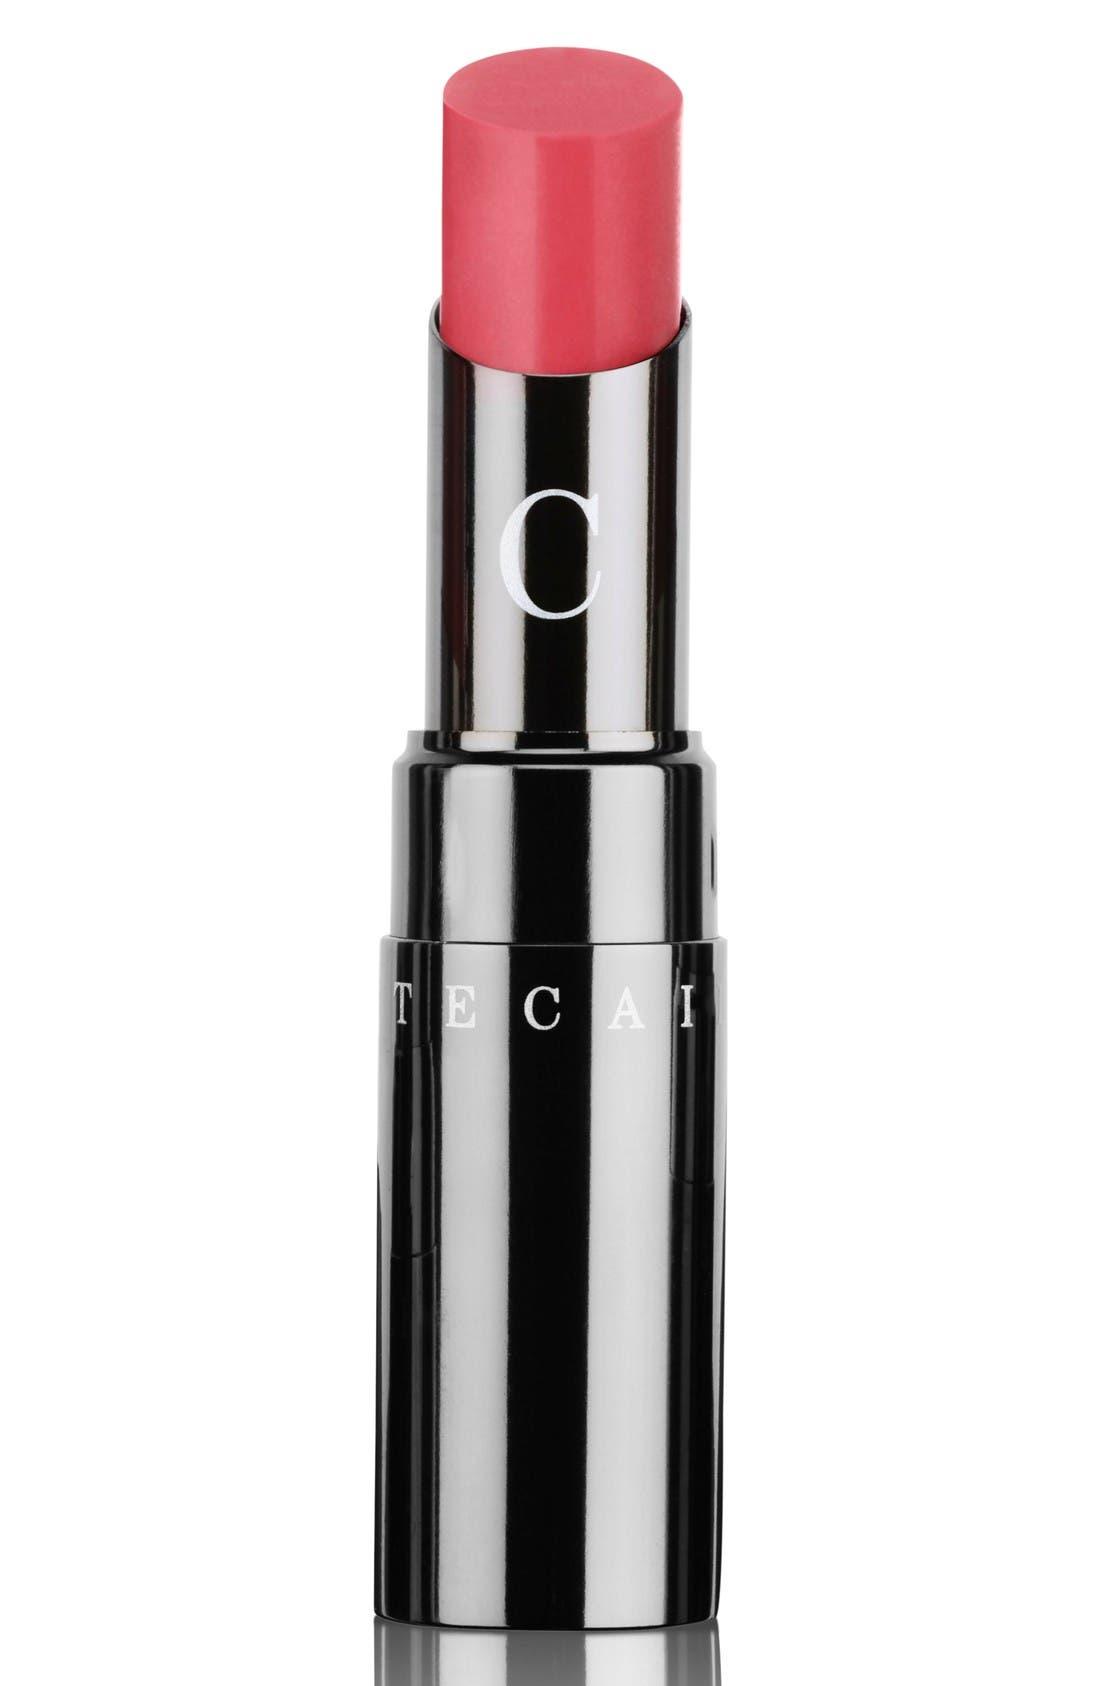 Chantecaille Lip Chic Lip Color